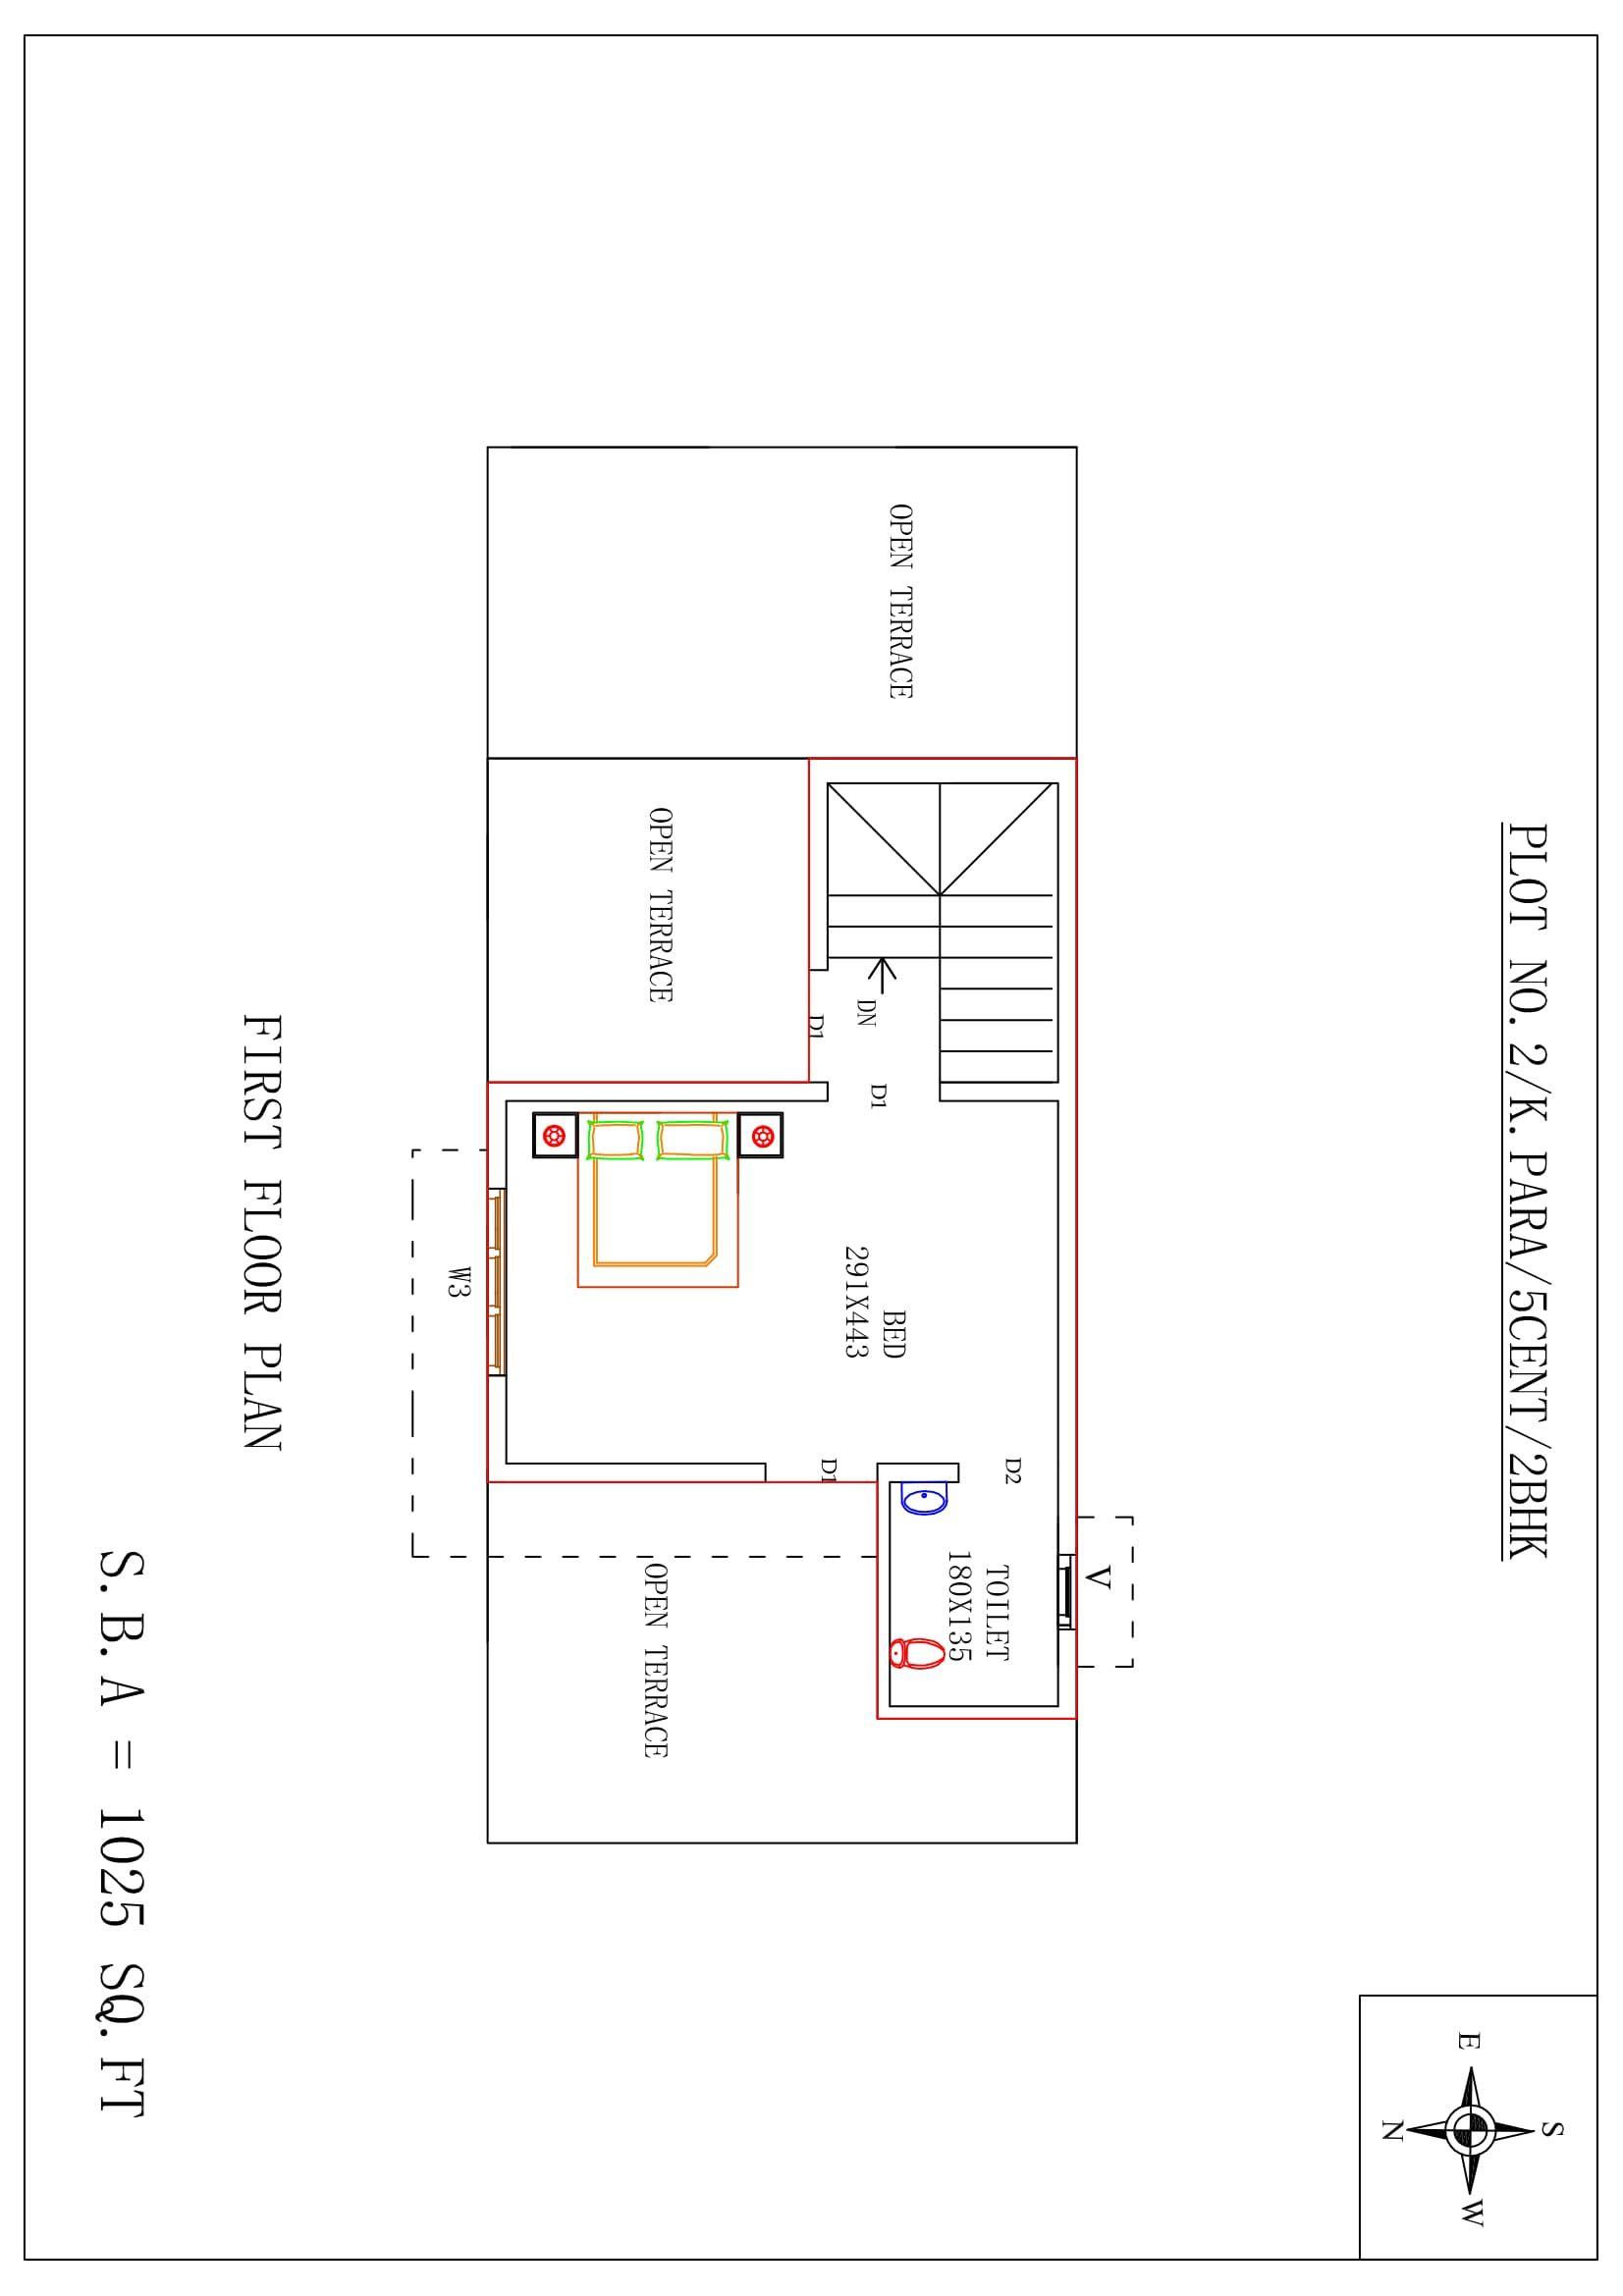 Shobhanam, 5 Cents, 1025 Sqft, 20 Lakhs Villa Floor plan